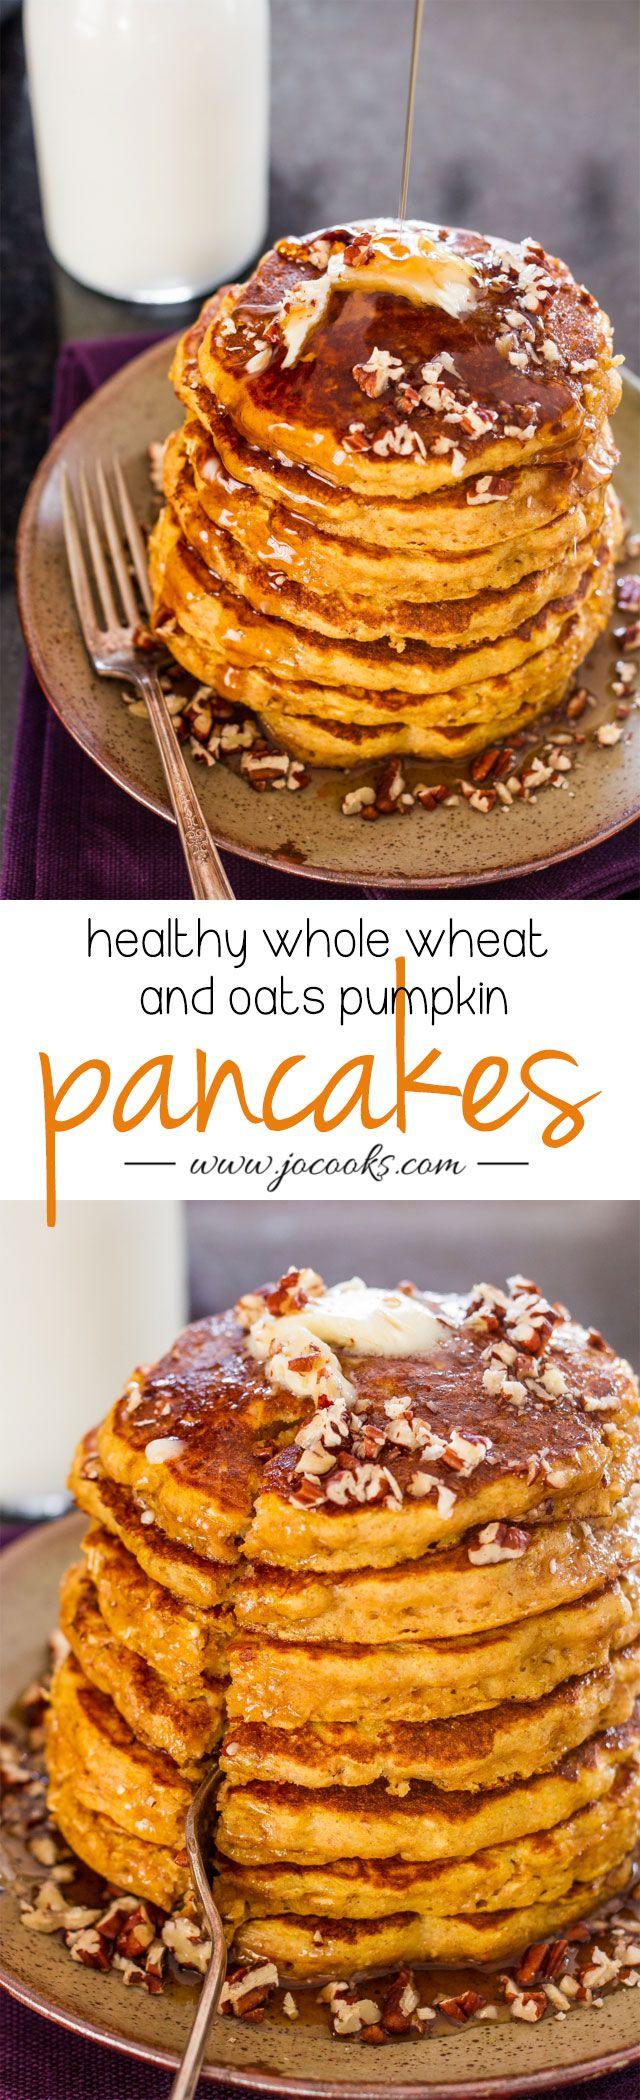 Healthy Whole Wheat and Oats Pumpkin Pancakes (pumpkin desserts, pumpkin breakfast, pumpkin recipes)